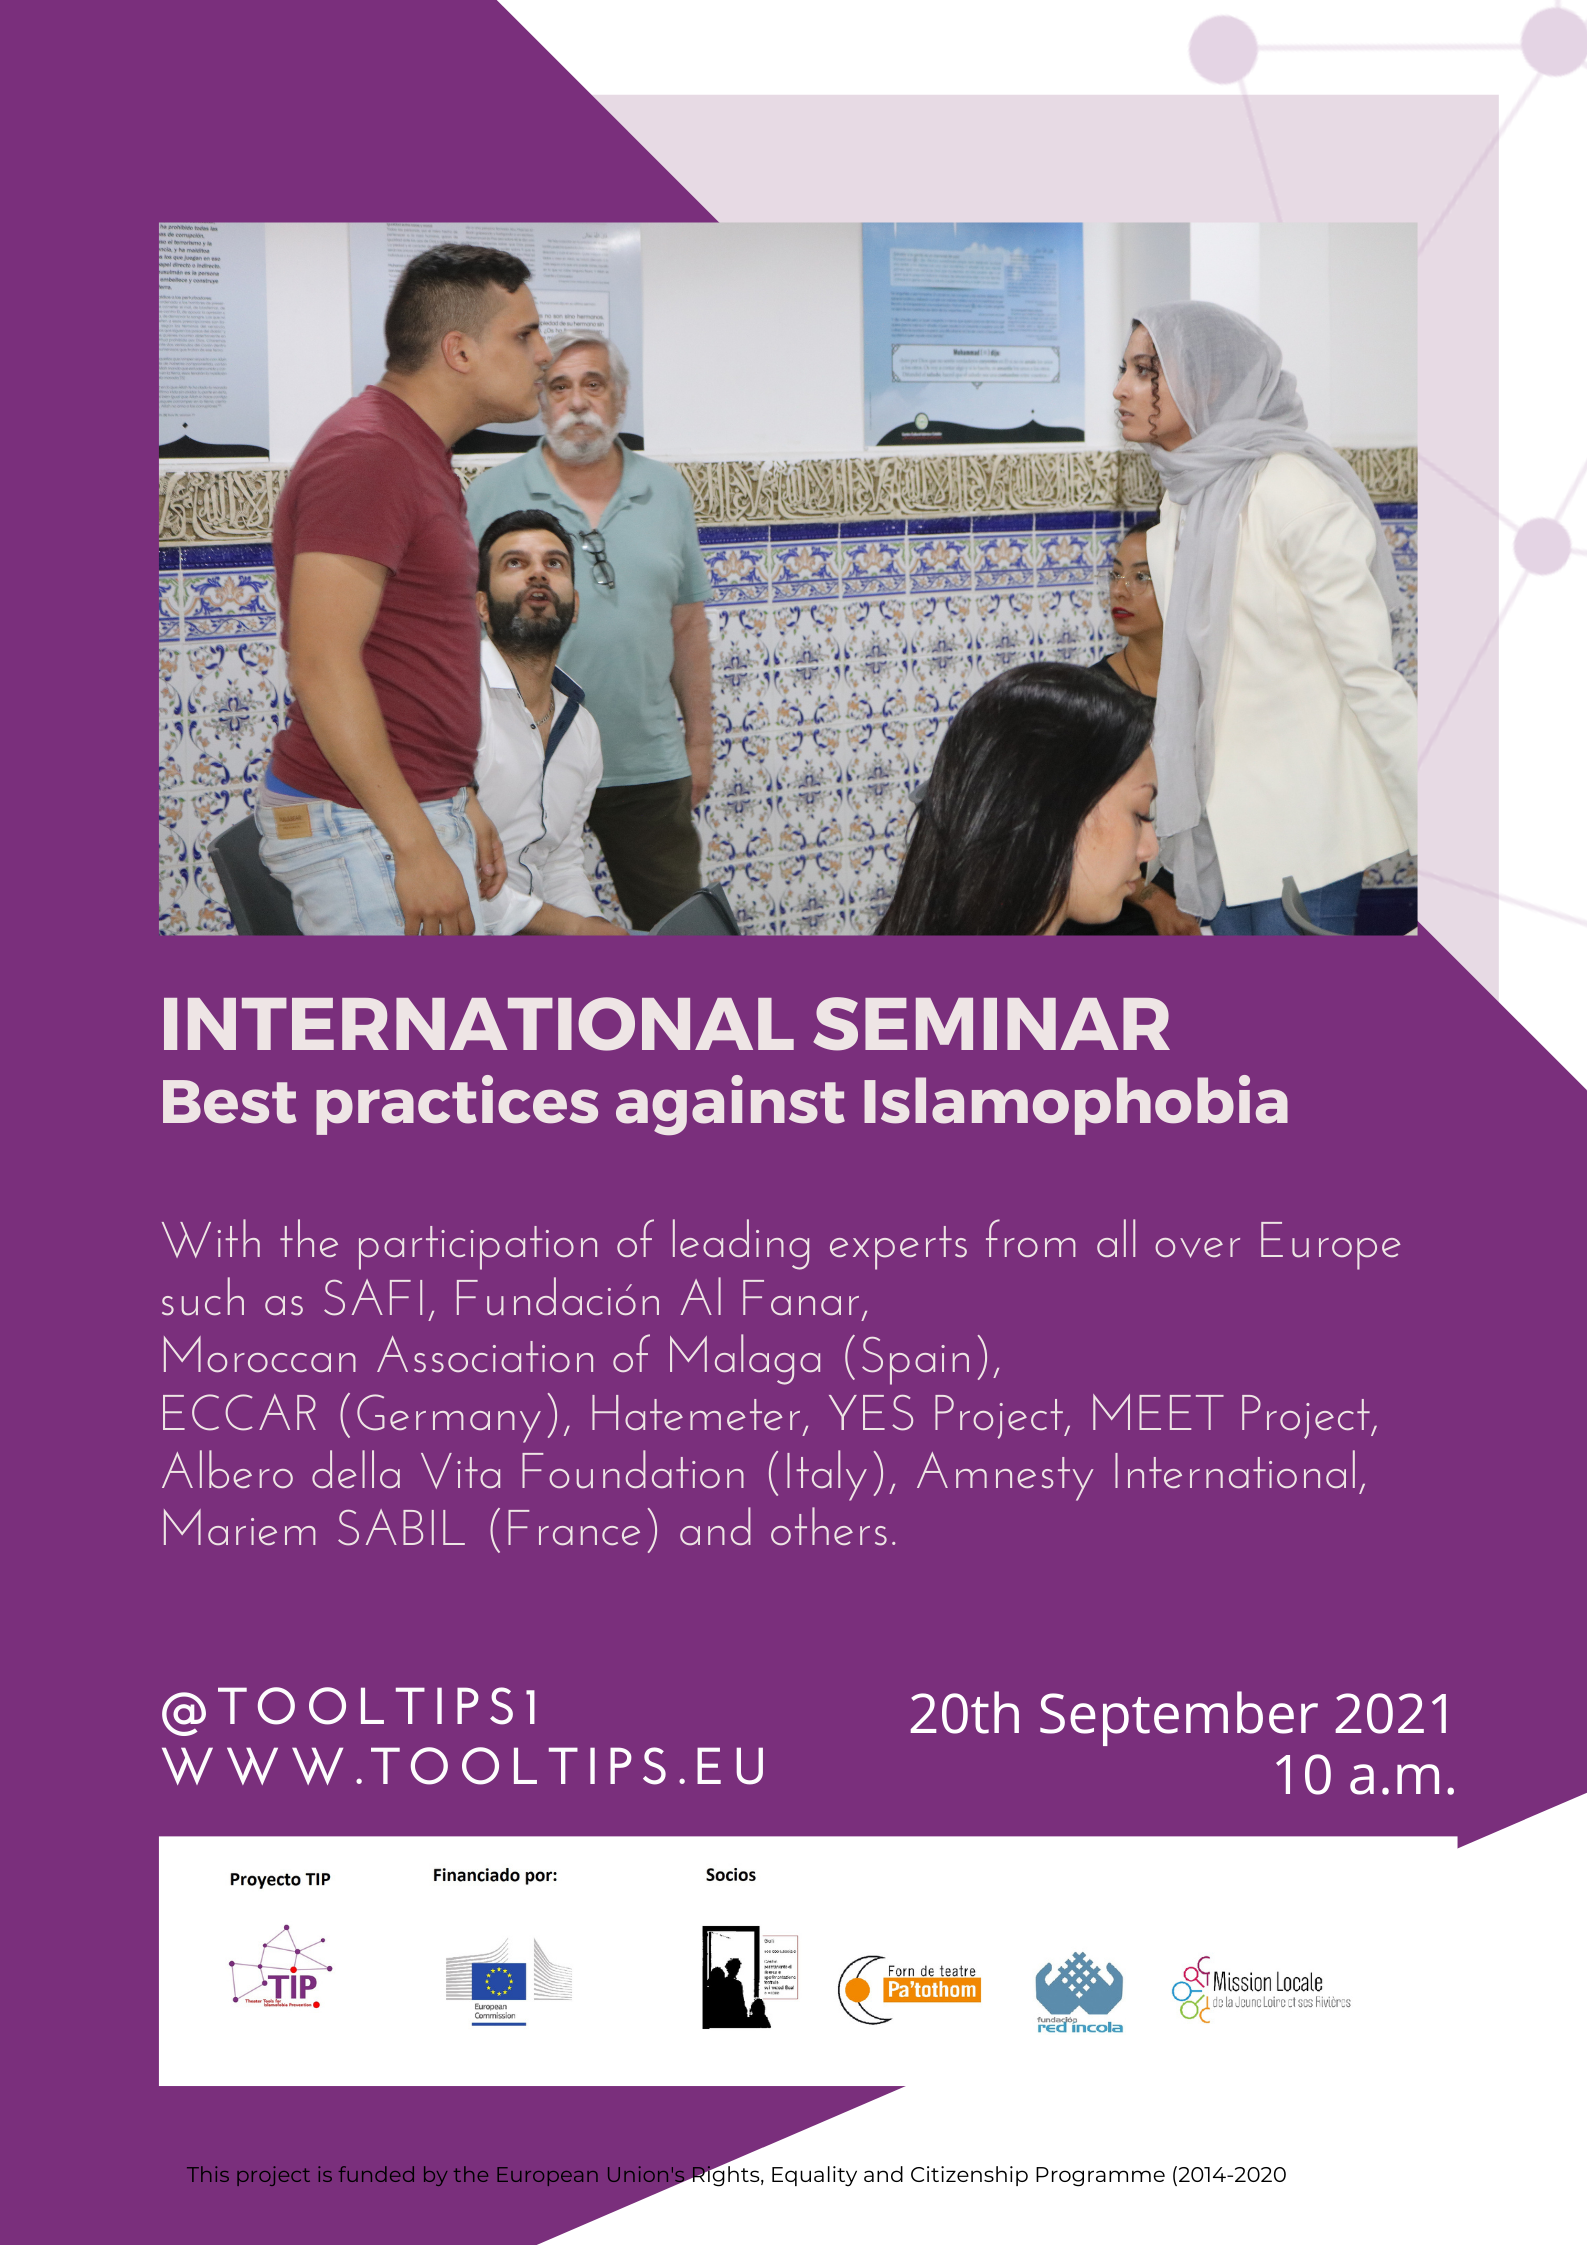 Forn de teatre Pa'tothom. International Seminar best practices against islamophobia